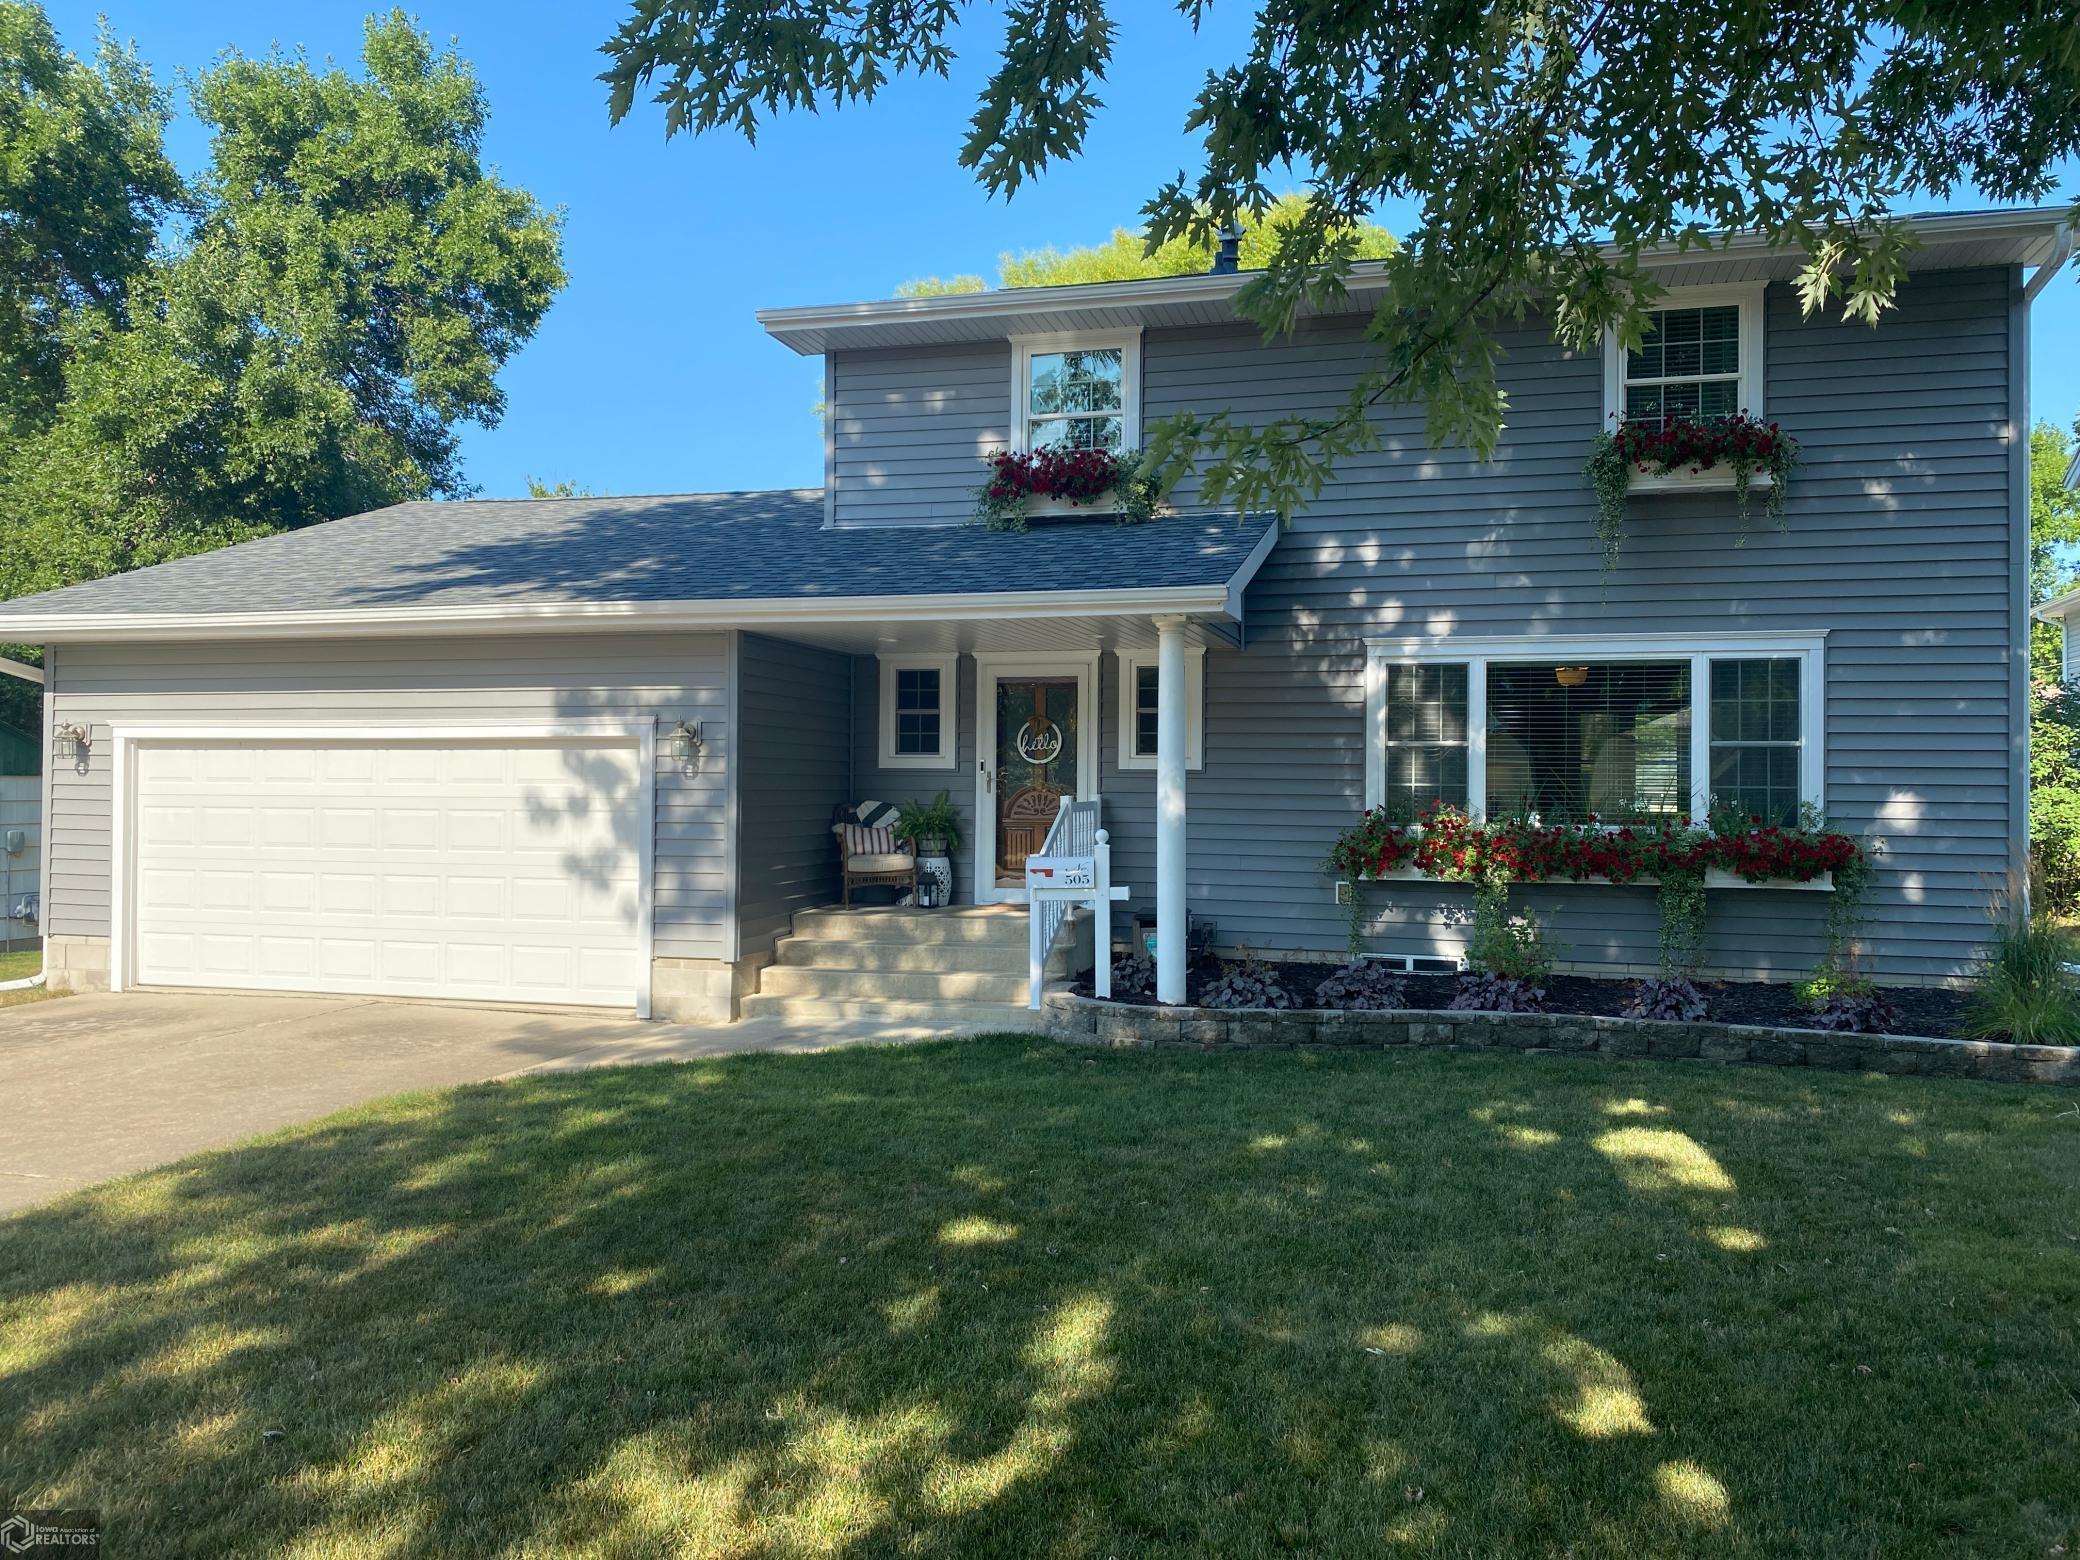 505 6th Street Property Photo - Humboldt, IA real estate listing